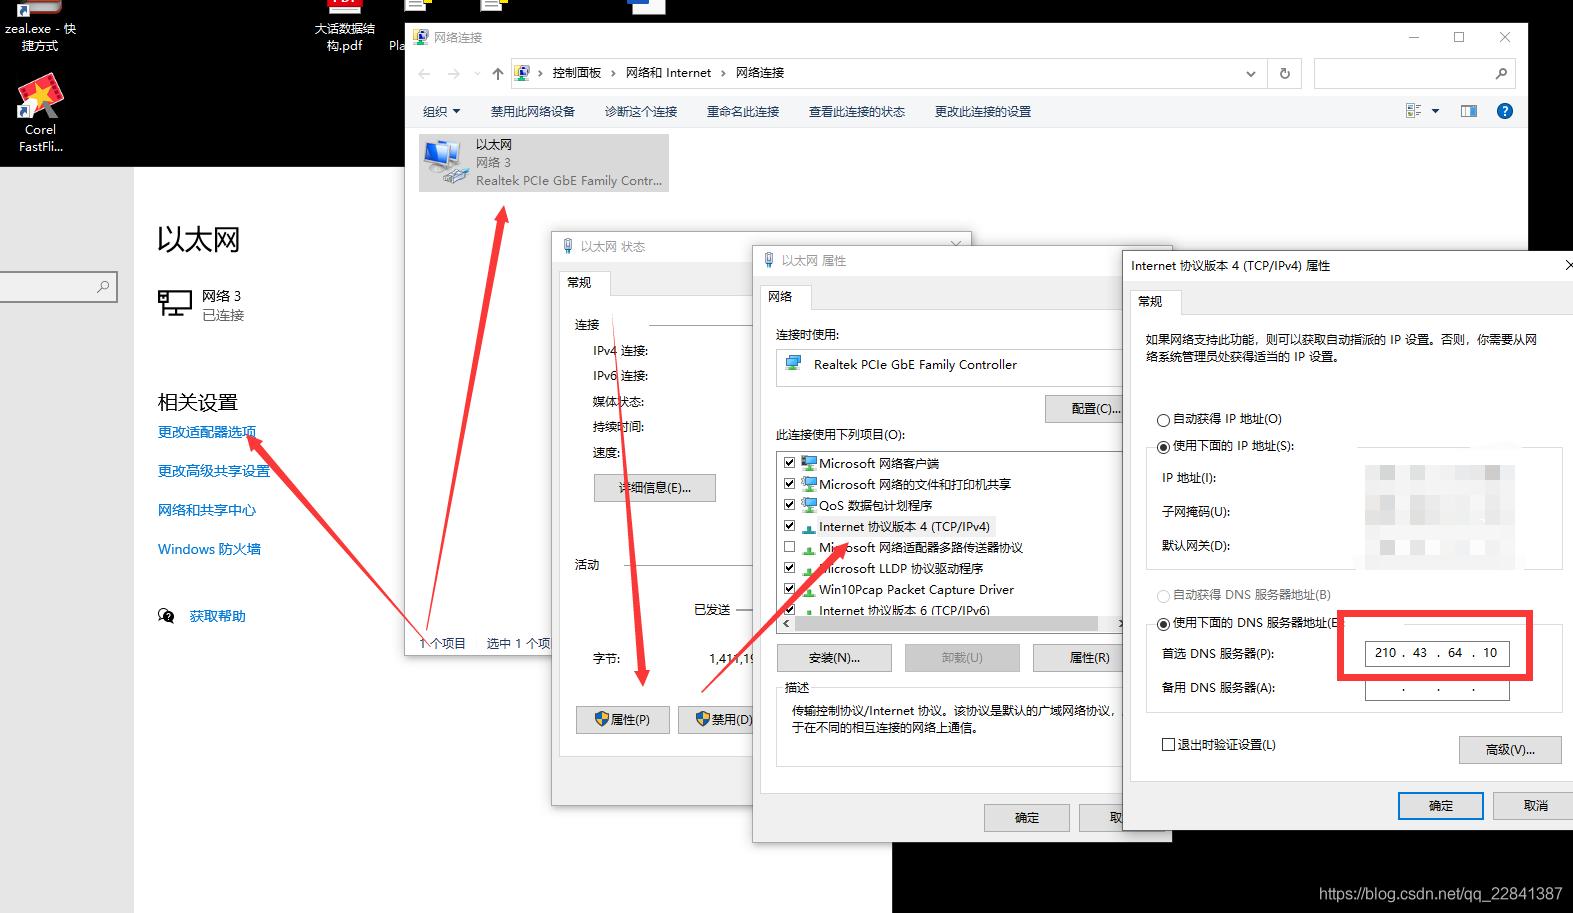 [外链图片转存失败,源站可能有防盗链机制,建议将图片保存下来直接上传(img-04dOg9Xt-1621149058738)(C:\Users\Uuuu\AppData\Roaming\Typora\typora-user-images\image-20210515214706473.png)]